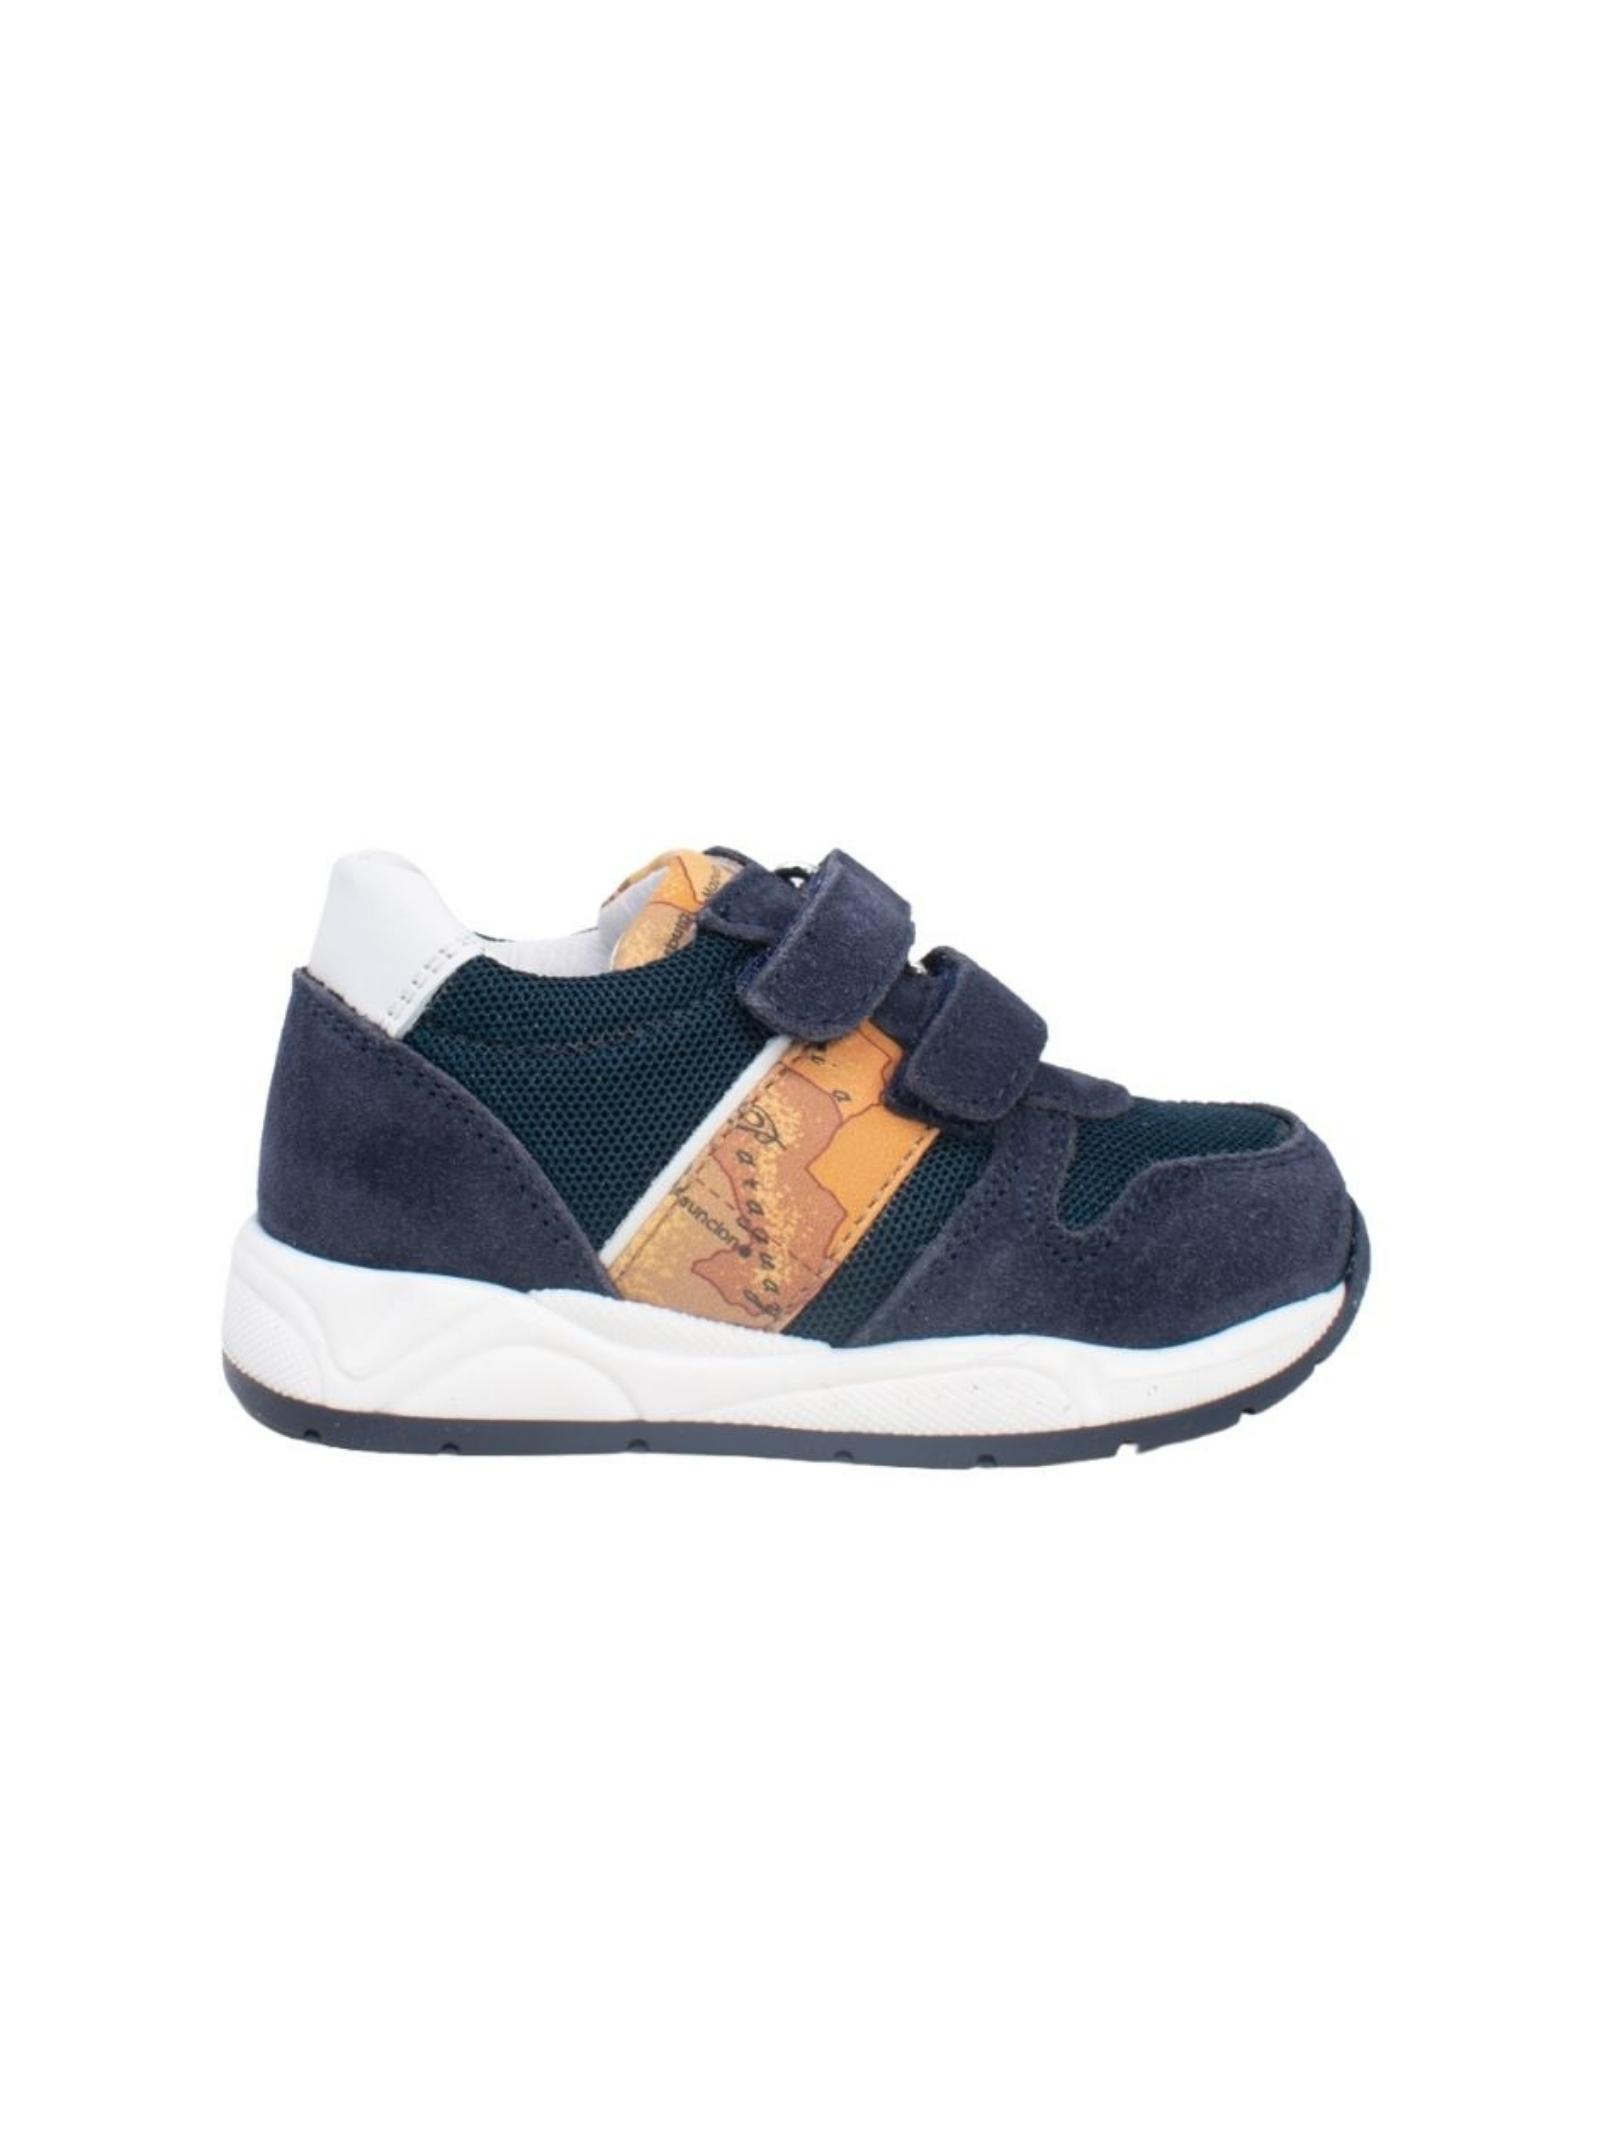 Sneakers Bambino Sport Geo ALVIERO MARTINI 1° CLASSE JUNIOR | Sneakers | 0970X138